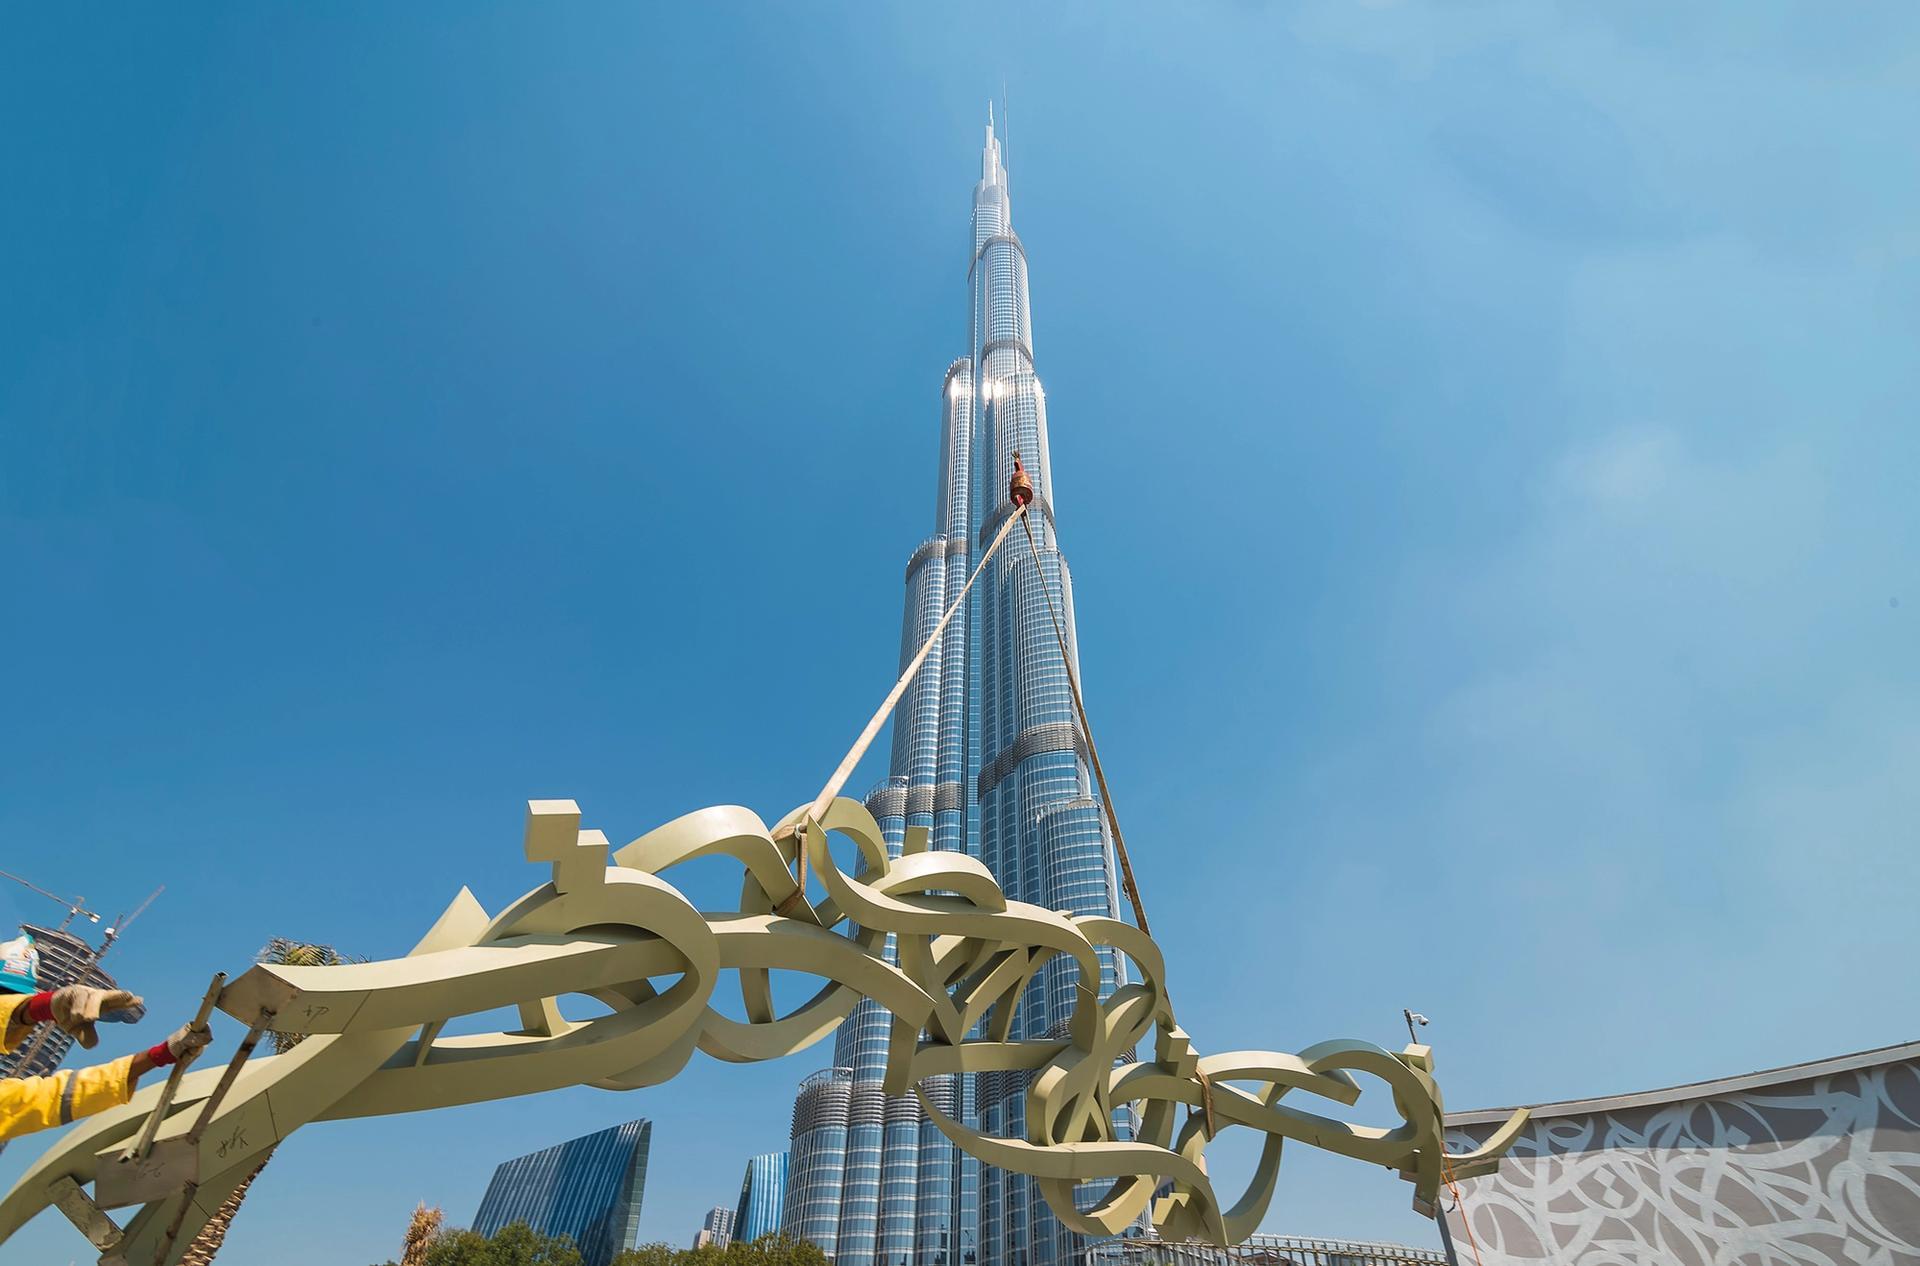 eL Seed's new works in front of the Burj Khalifa in Dubai Christina Dimitrova. Courtesy of eL Seed studio